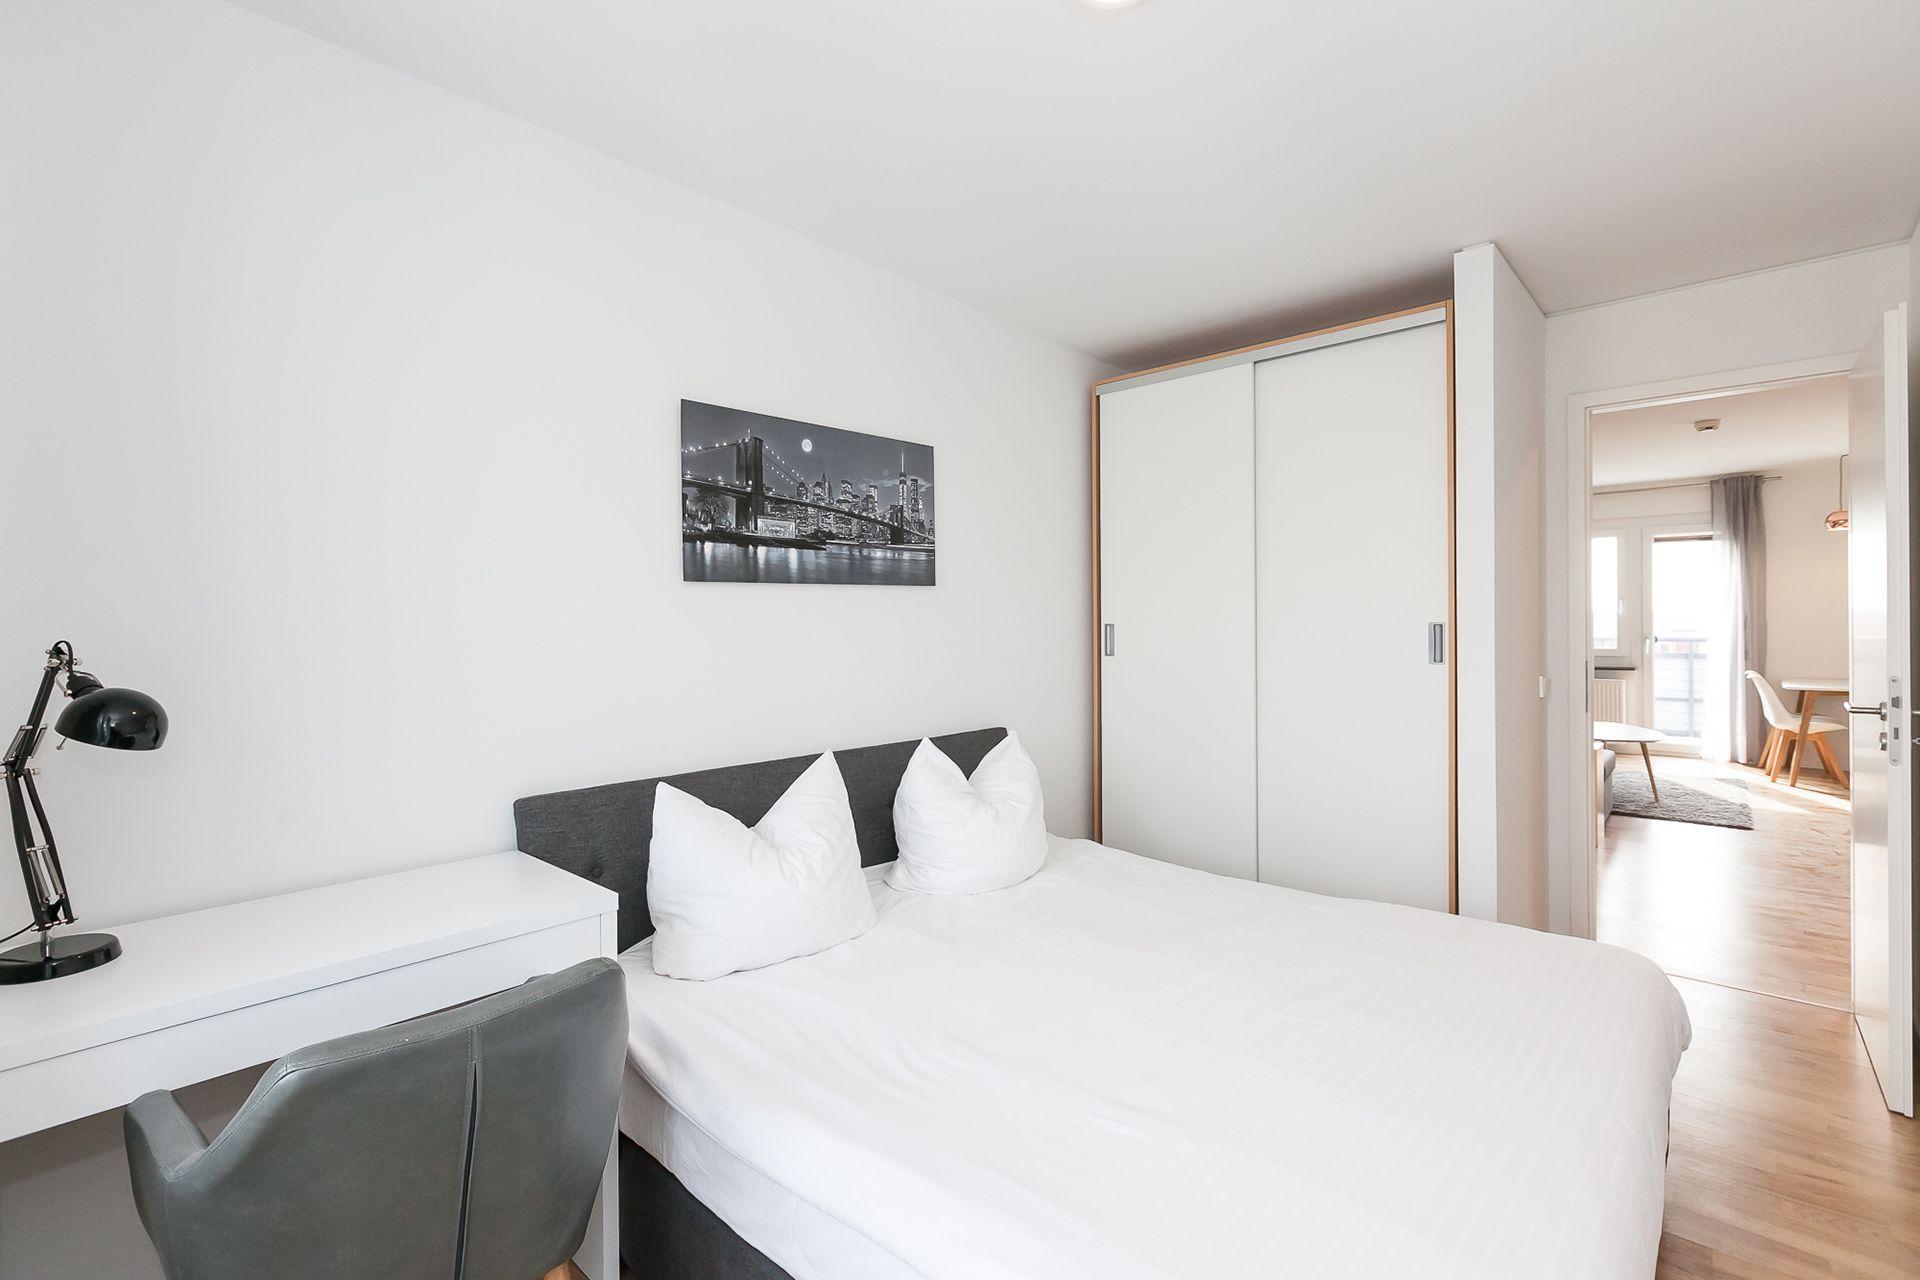 2 Bedroom - Medium apartment to rent in Berlin KOEP-KOEP-0407-0